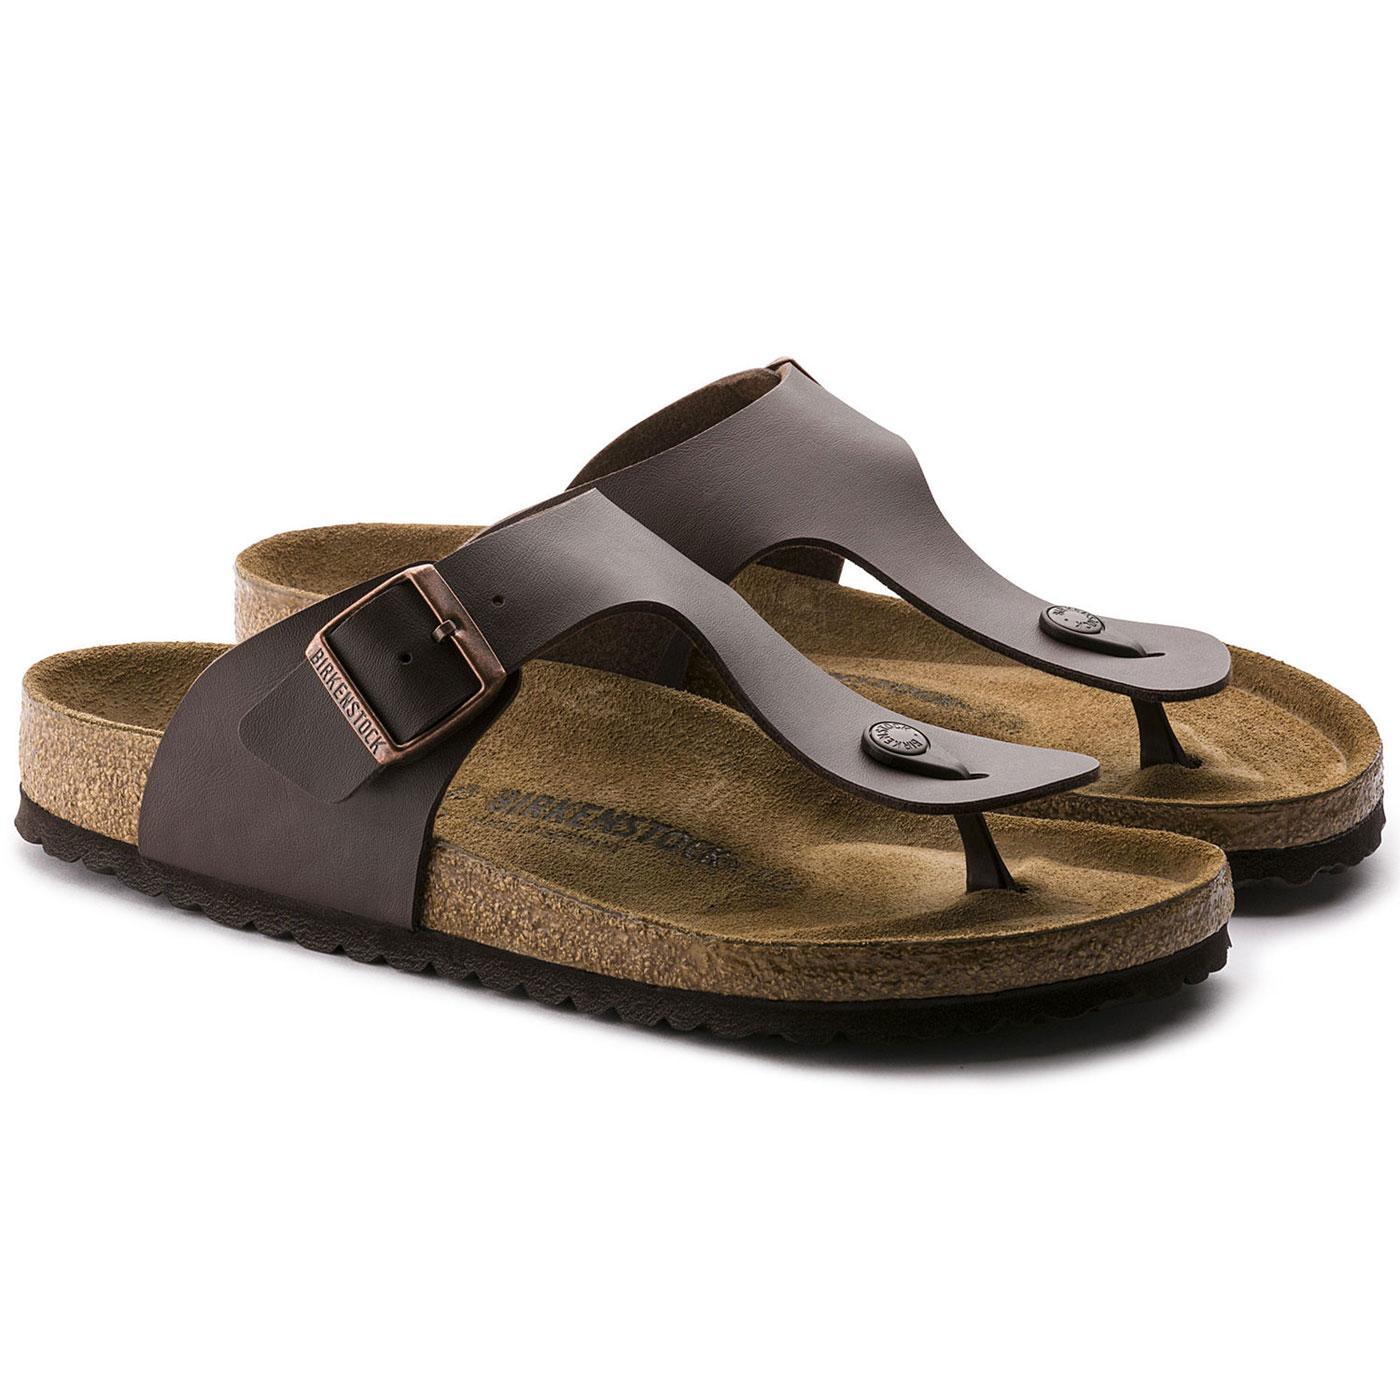 Ramses BIRKENSTOCK Men's Retro Toe Grip Sandals DB